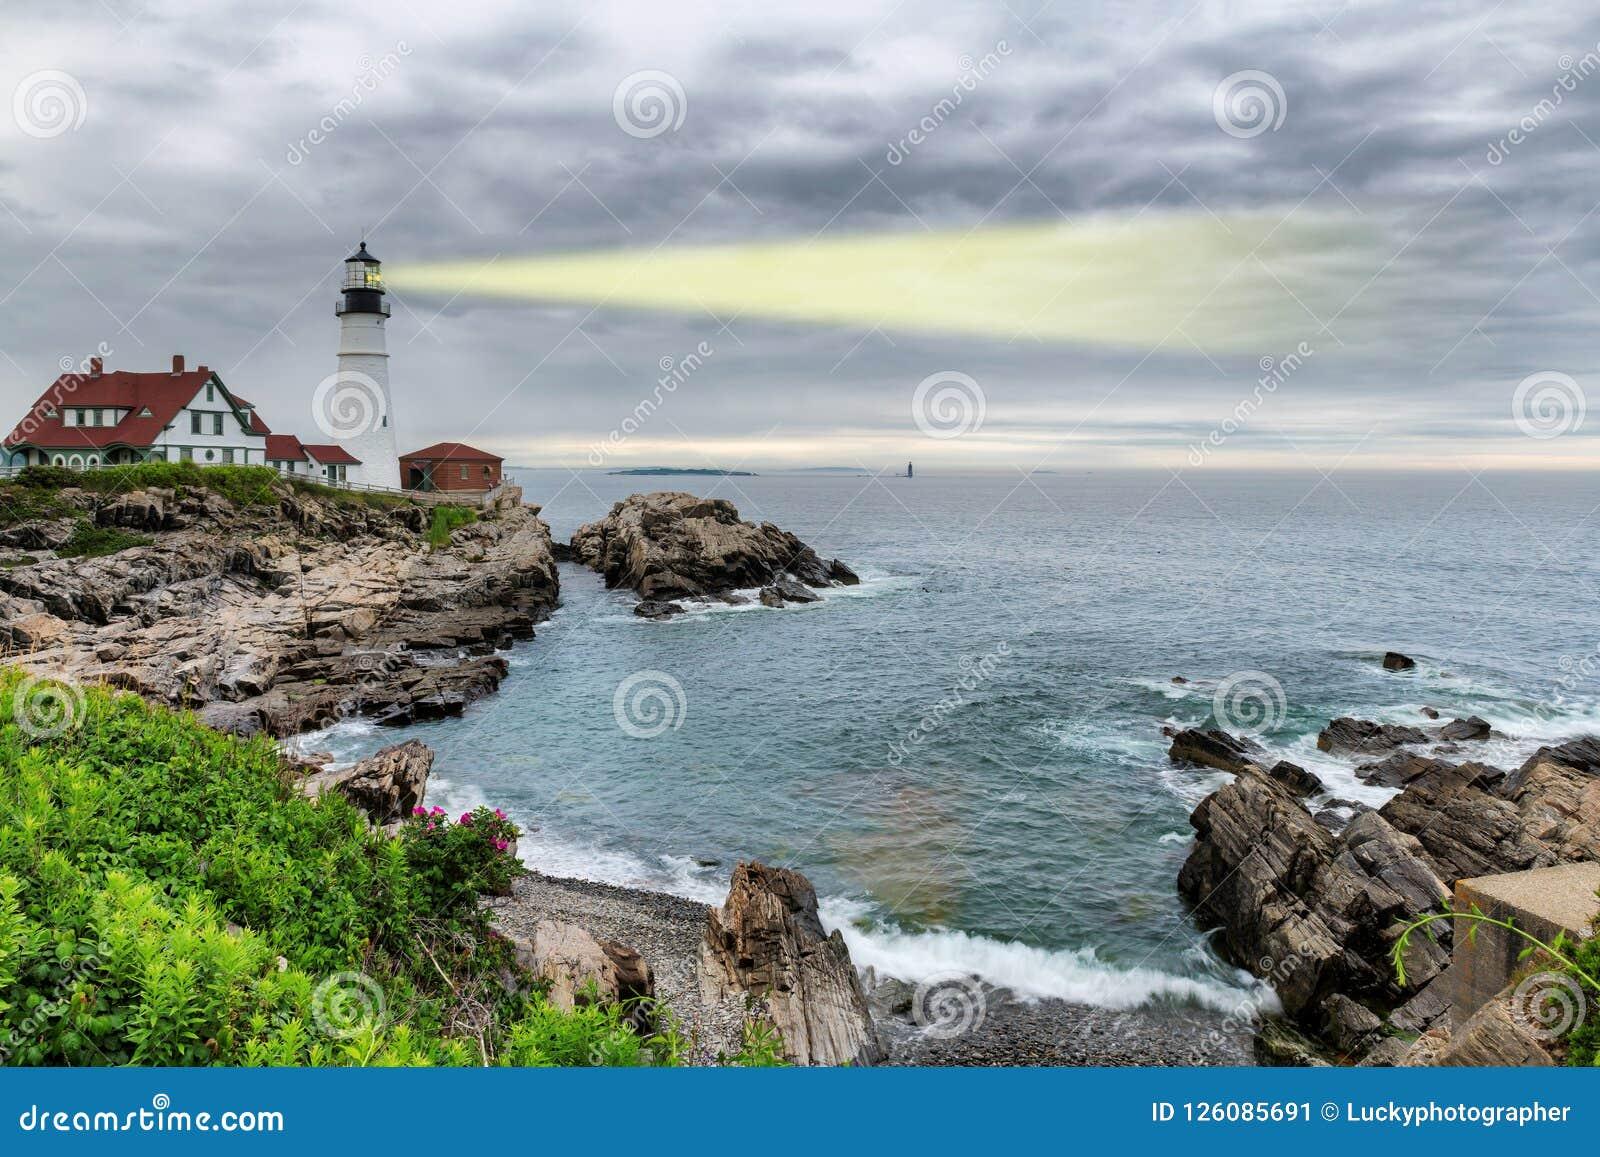 Light beam of Portland Lighthouse in Cape Elizabeth, Maine, USA